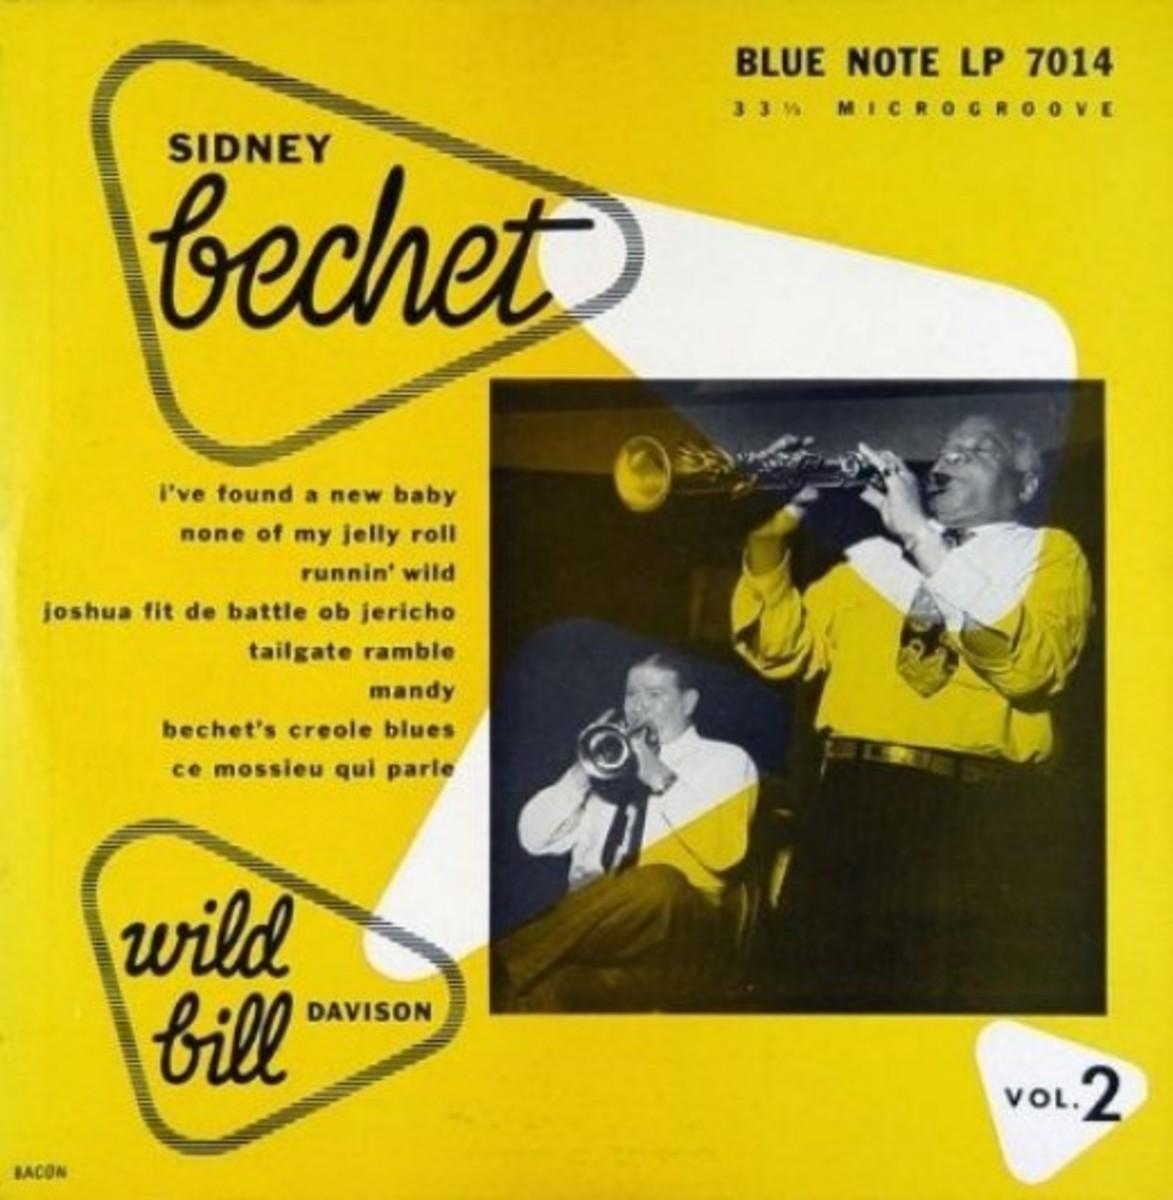 "Sidney Bechet Wild Bill Davison, vol 2 BLP 7014 10"" LP Vinyl Microgroove Record (1951) Album Cover Design by Paul Bacon Photo by Francis Wolff"